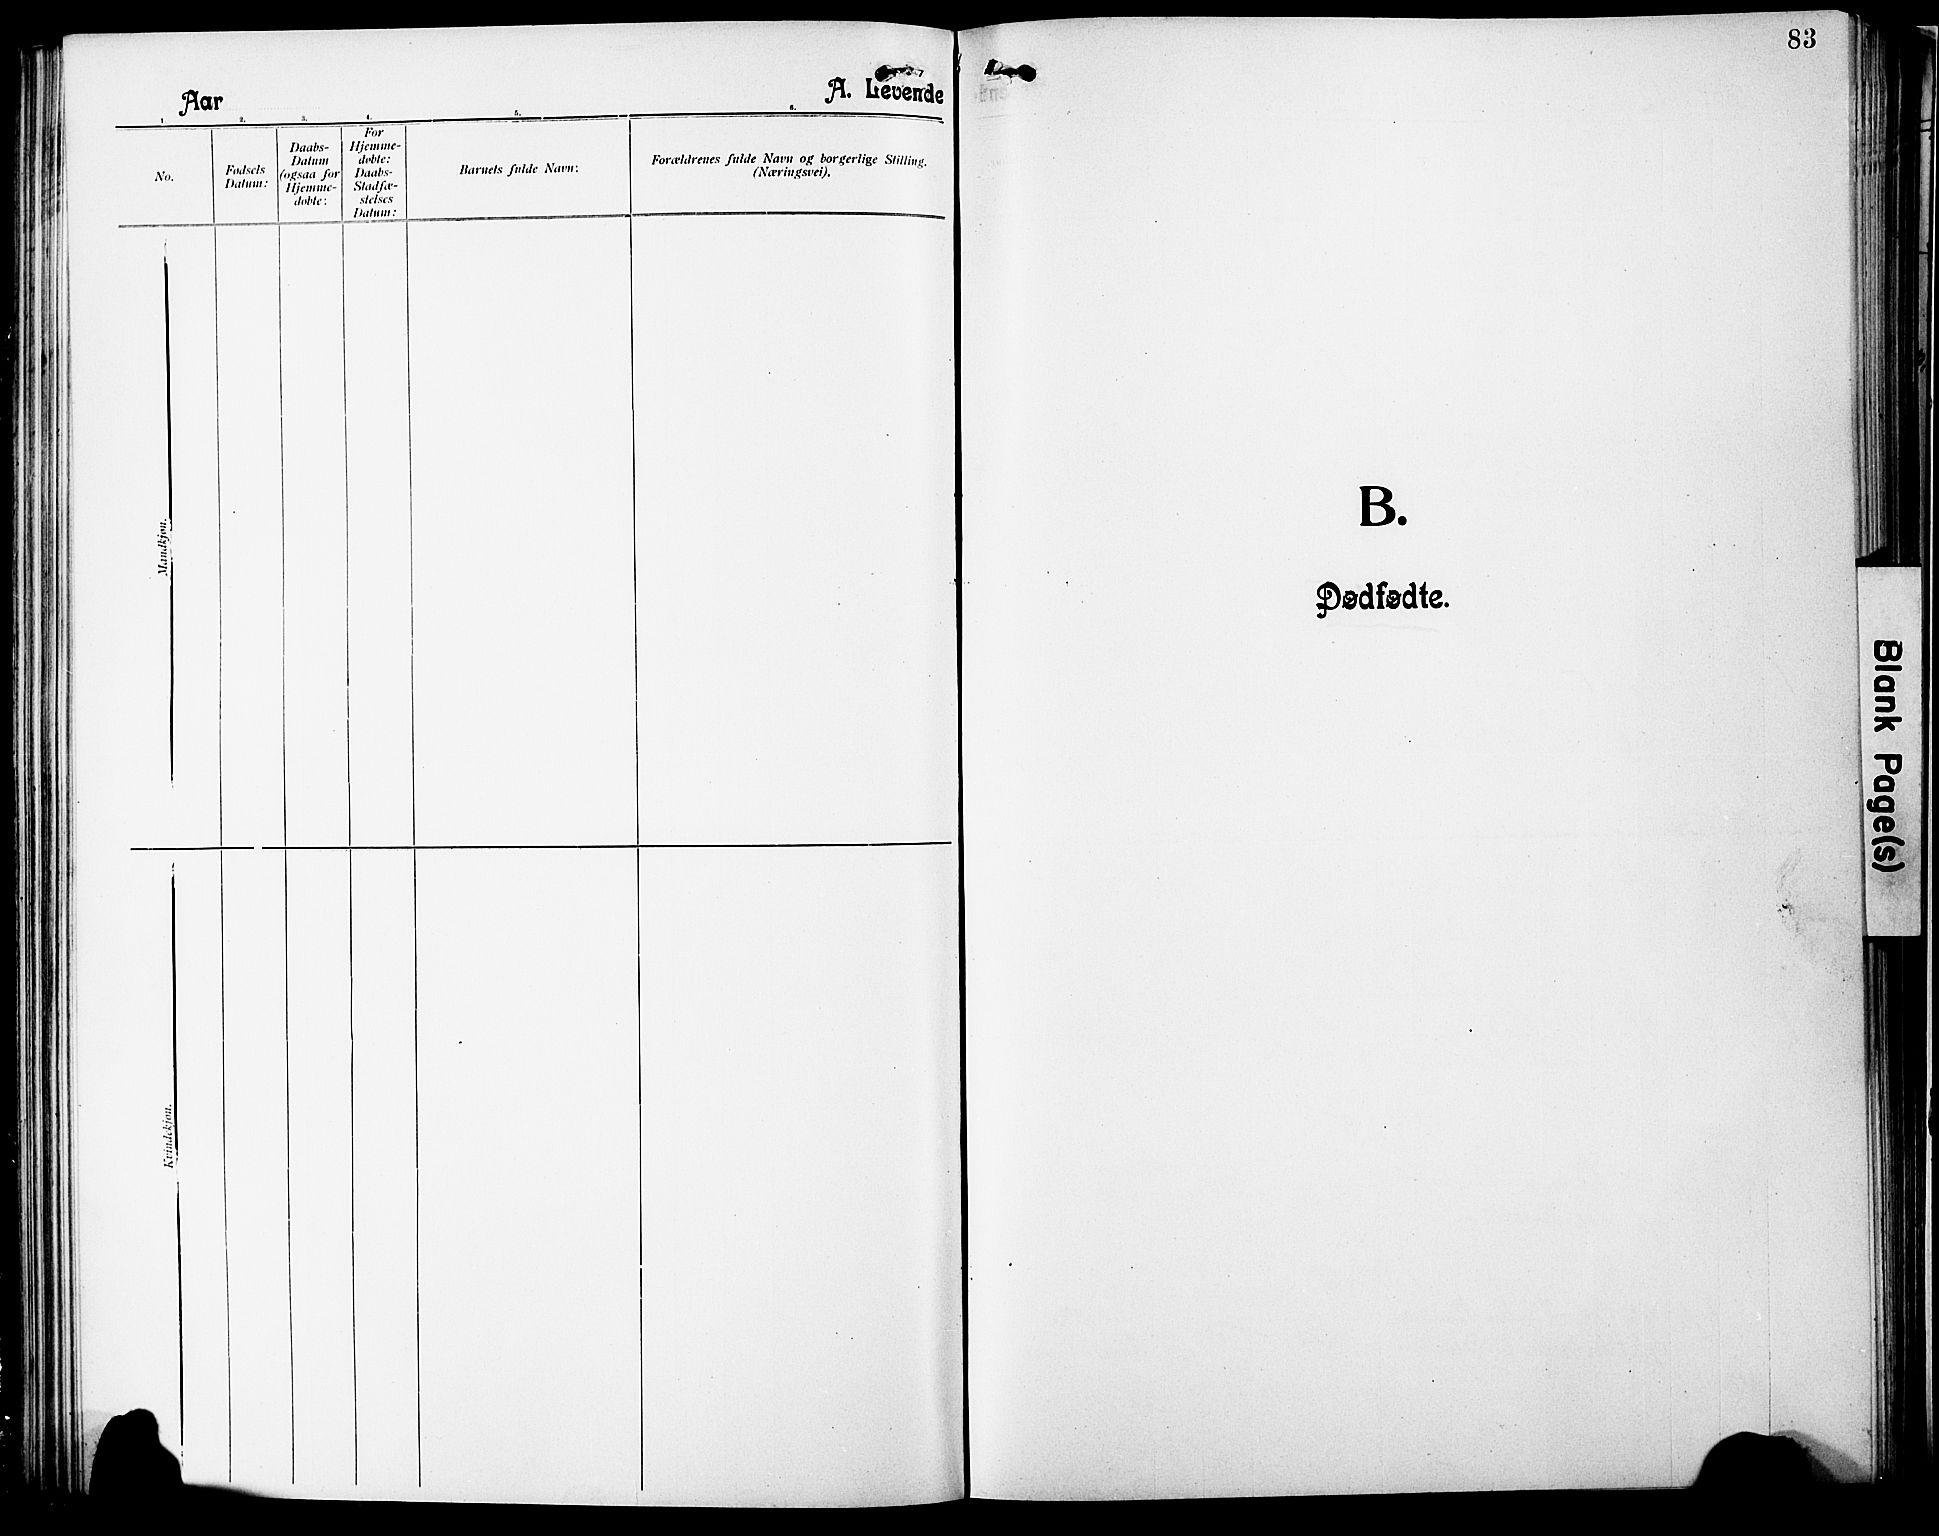 SAT, Ministerialprotokoller, klokkerbøker og fødselsregistre - Nordland, 803/L0077: Klokkerbok nr. 803C04, 1897-1930, s. 83